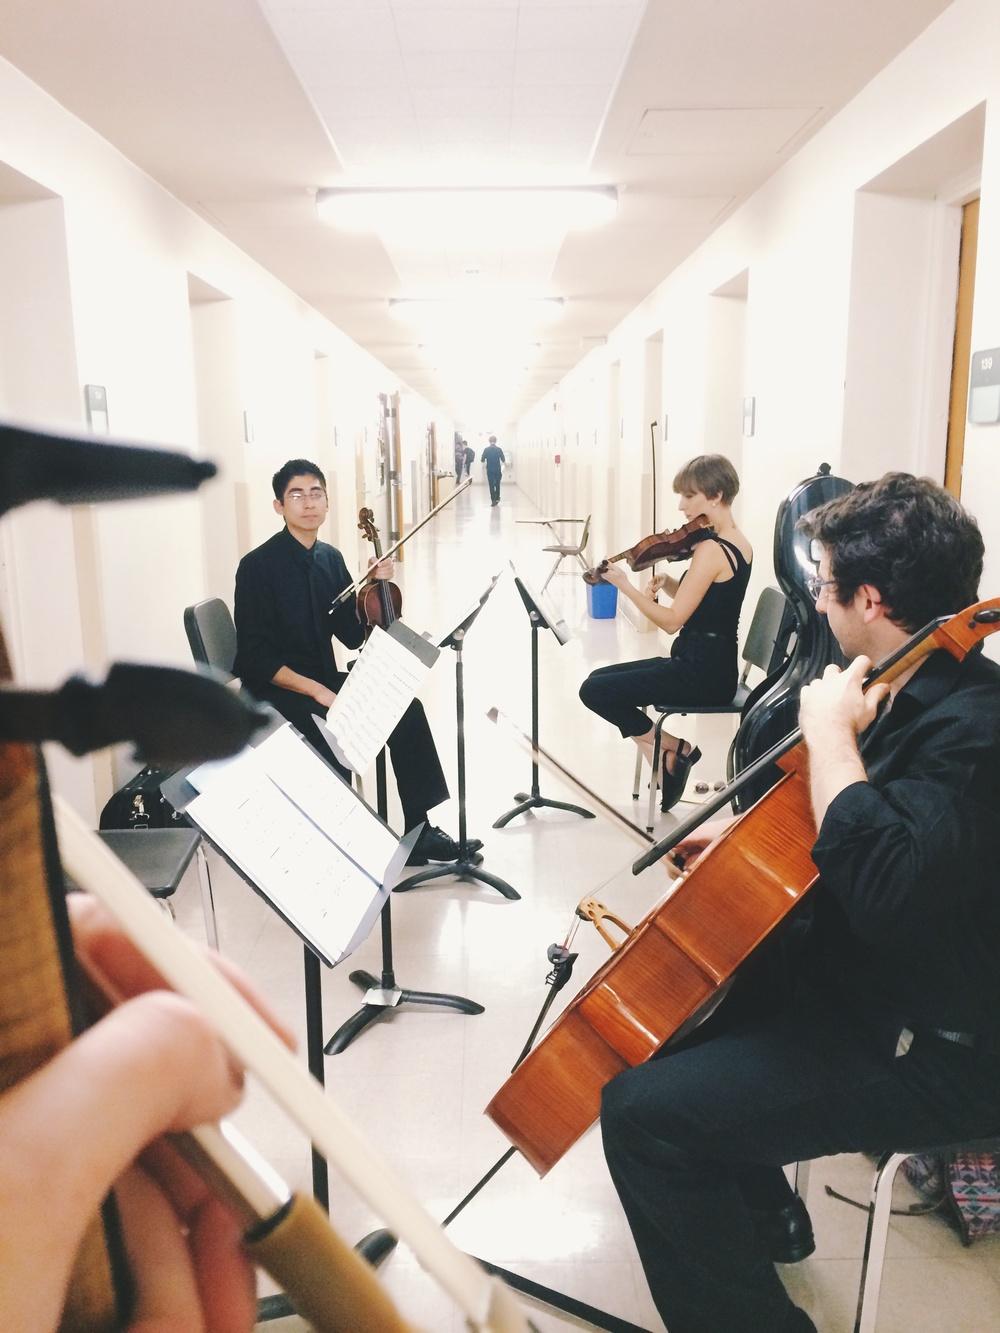 impromptu quartet rehearsal in the hallway